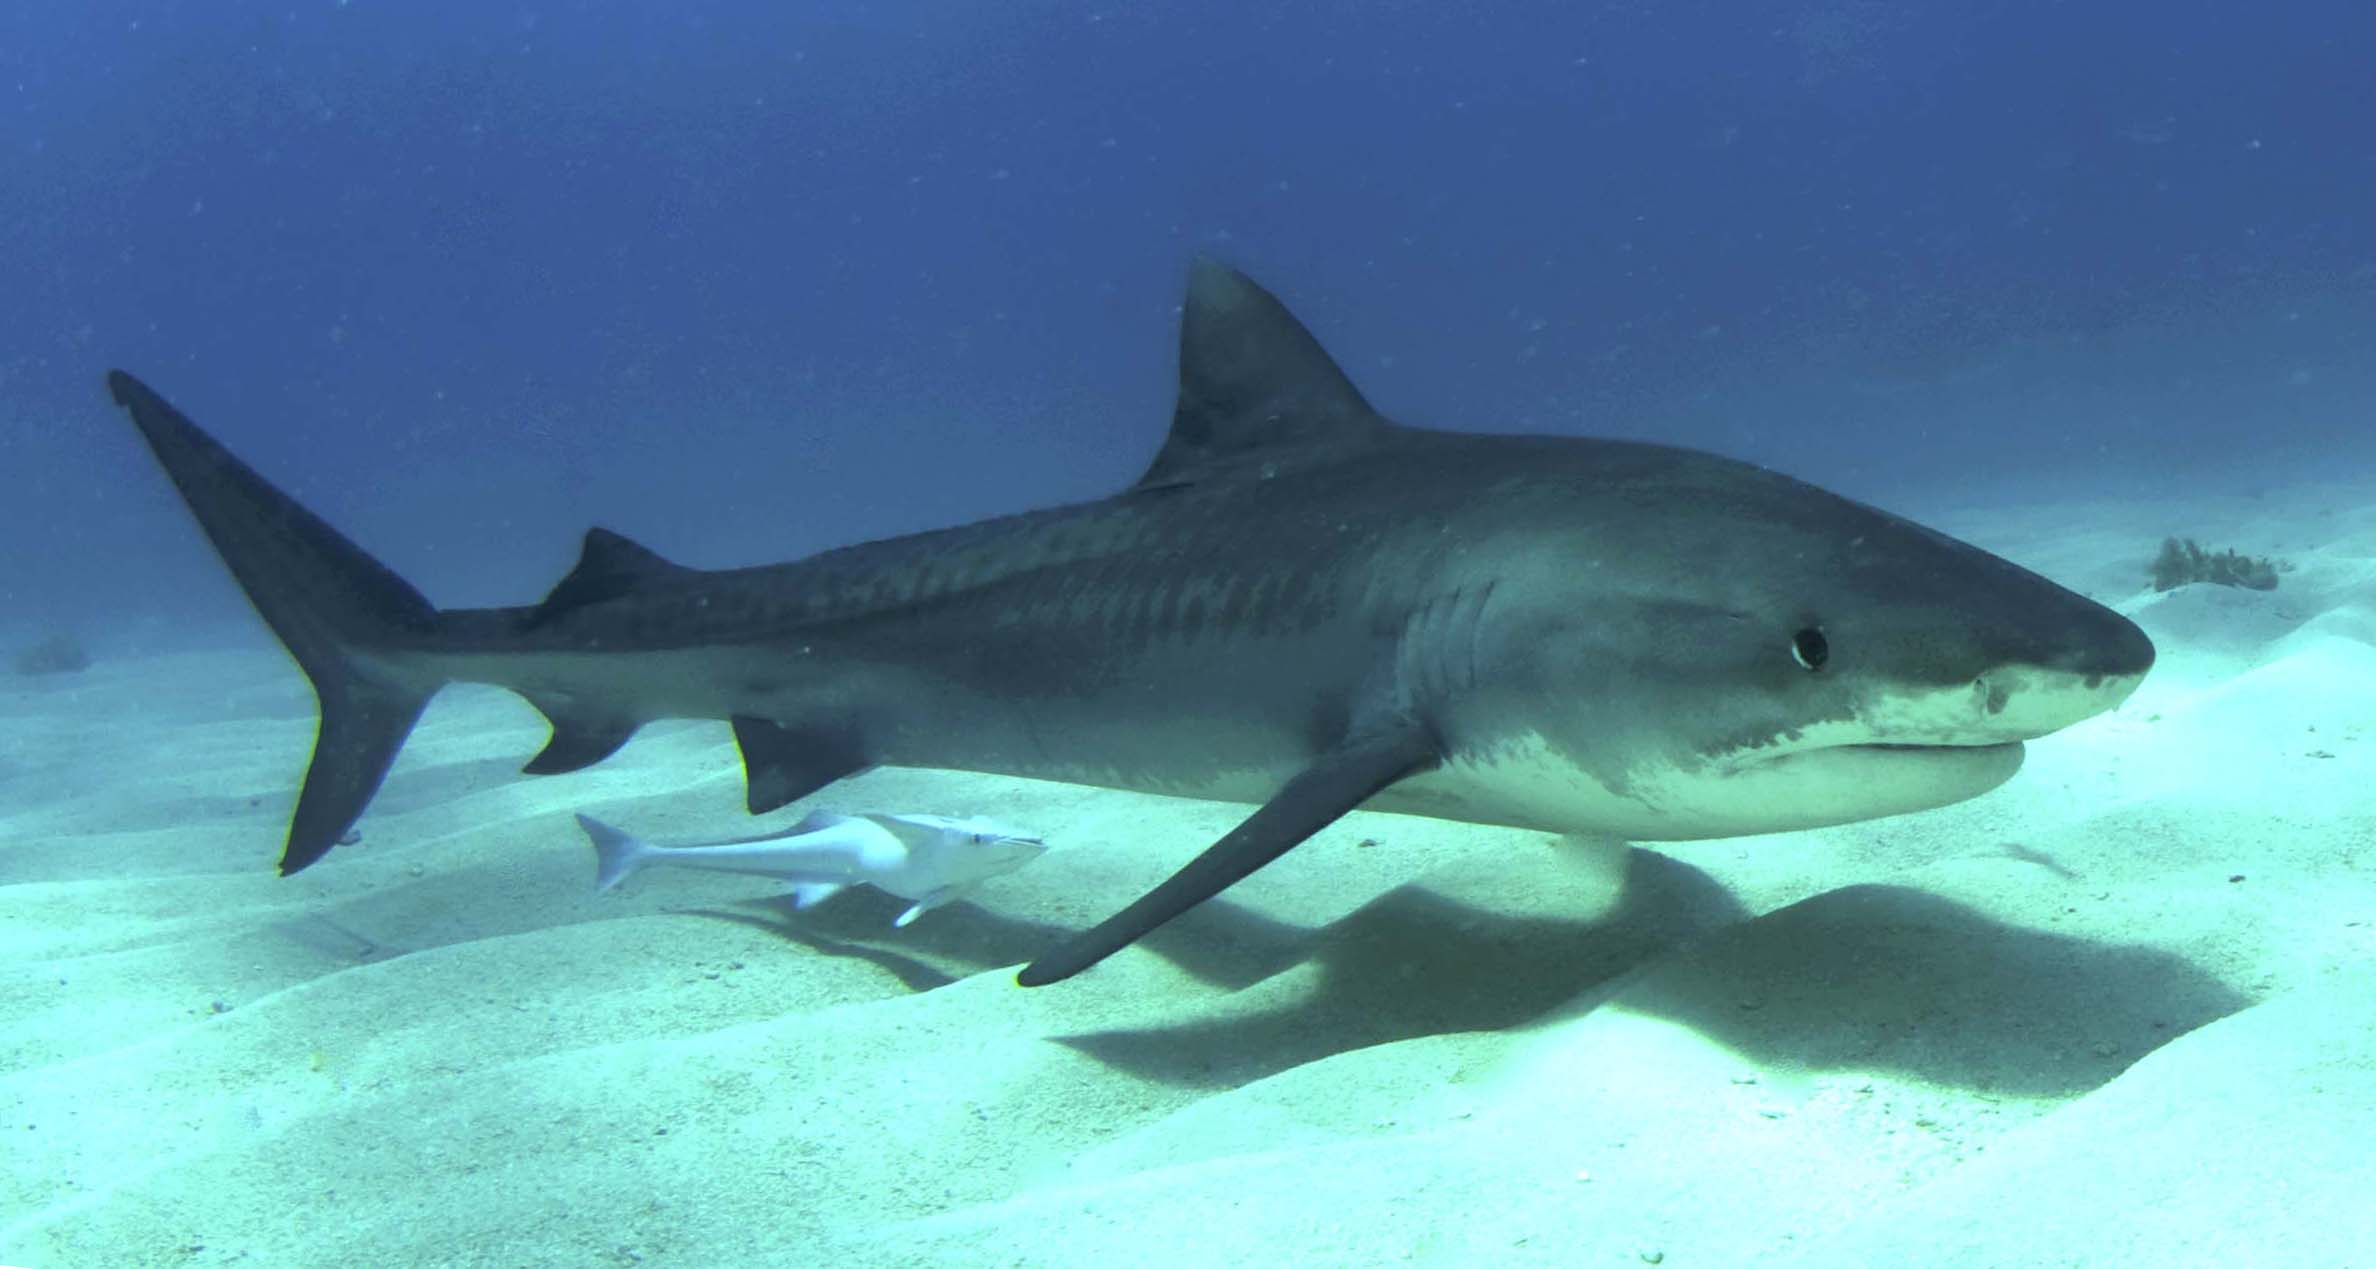 Shark Wallpaper HD Page of  i